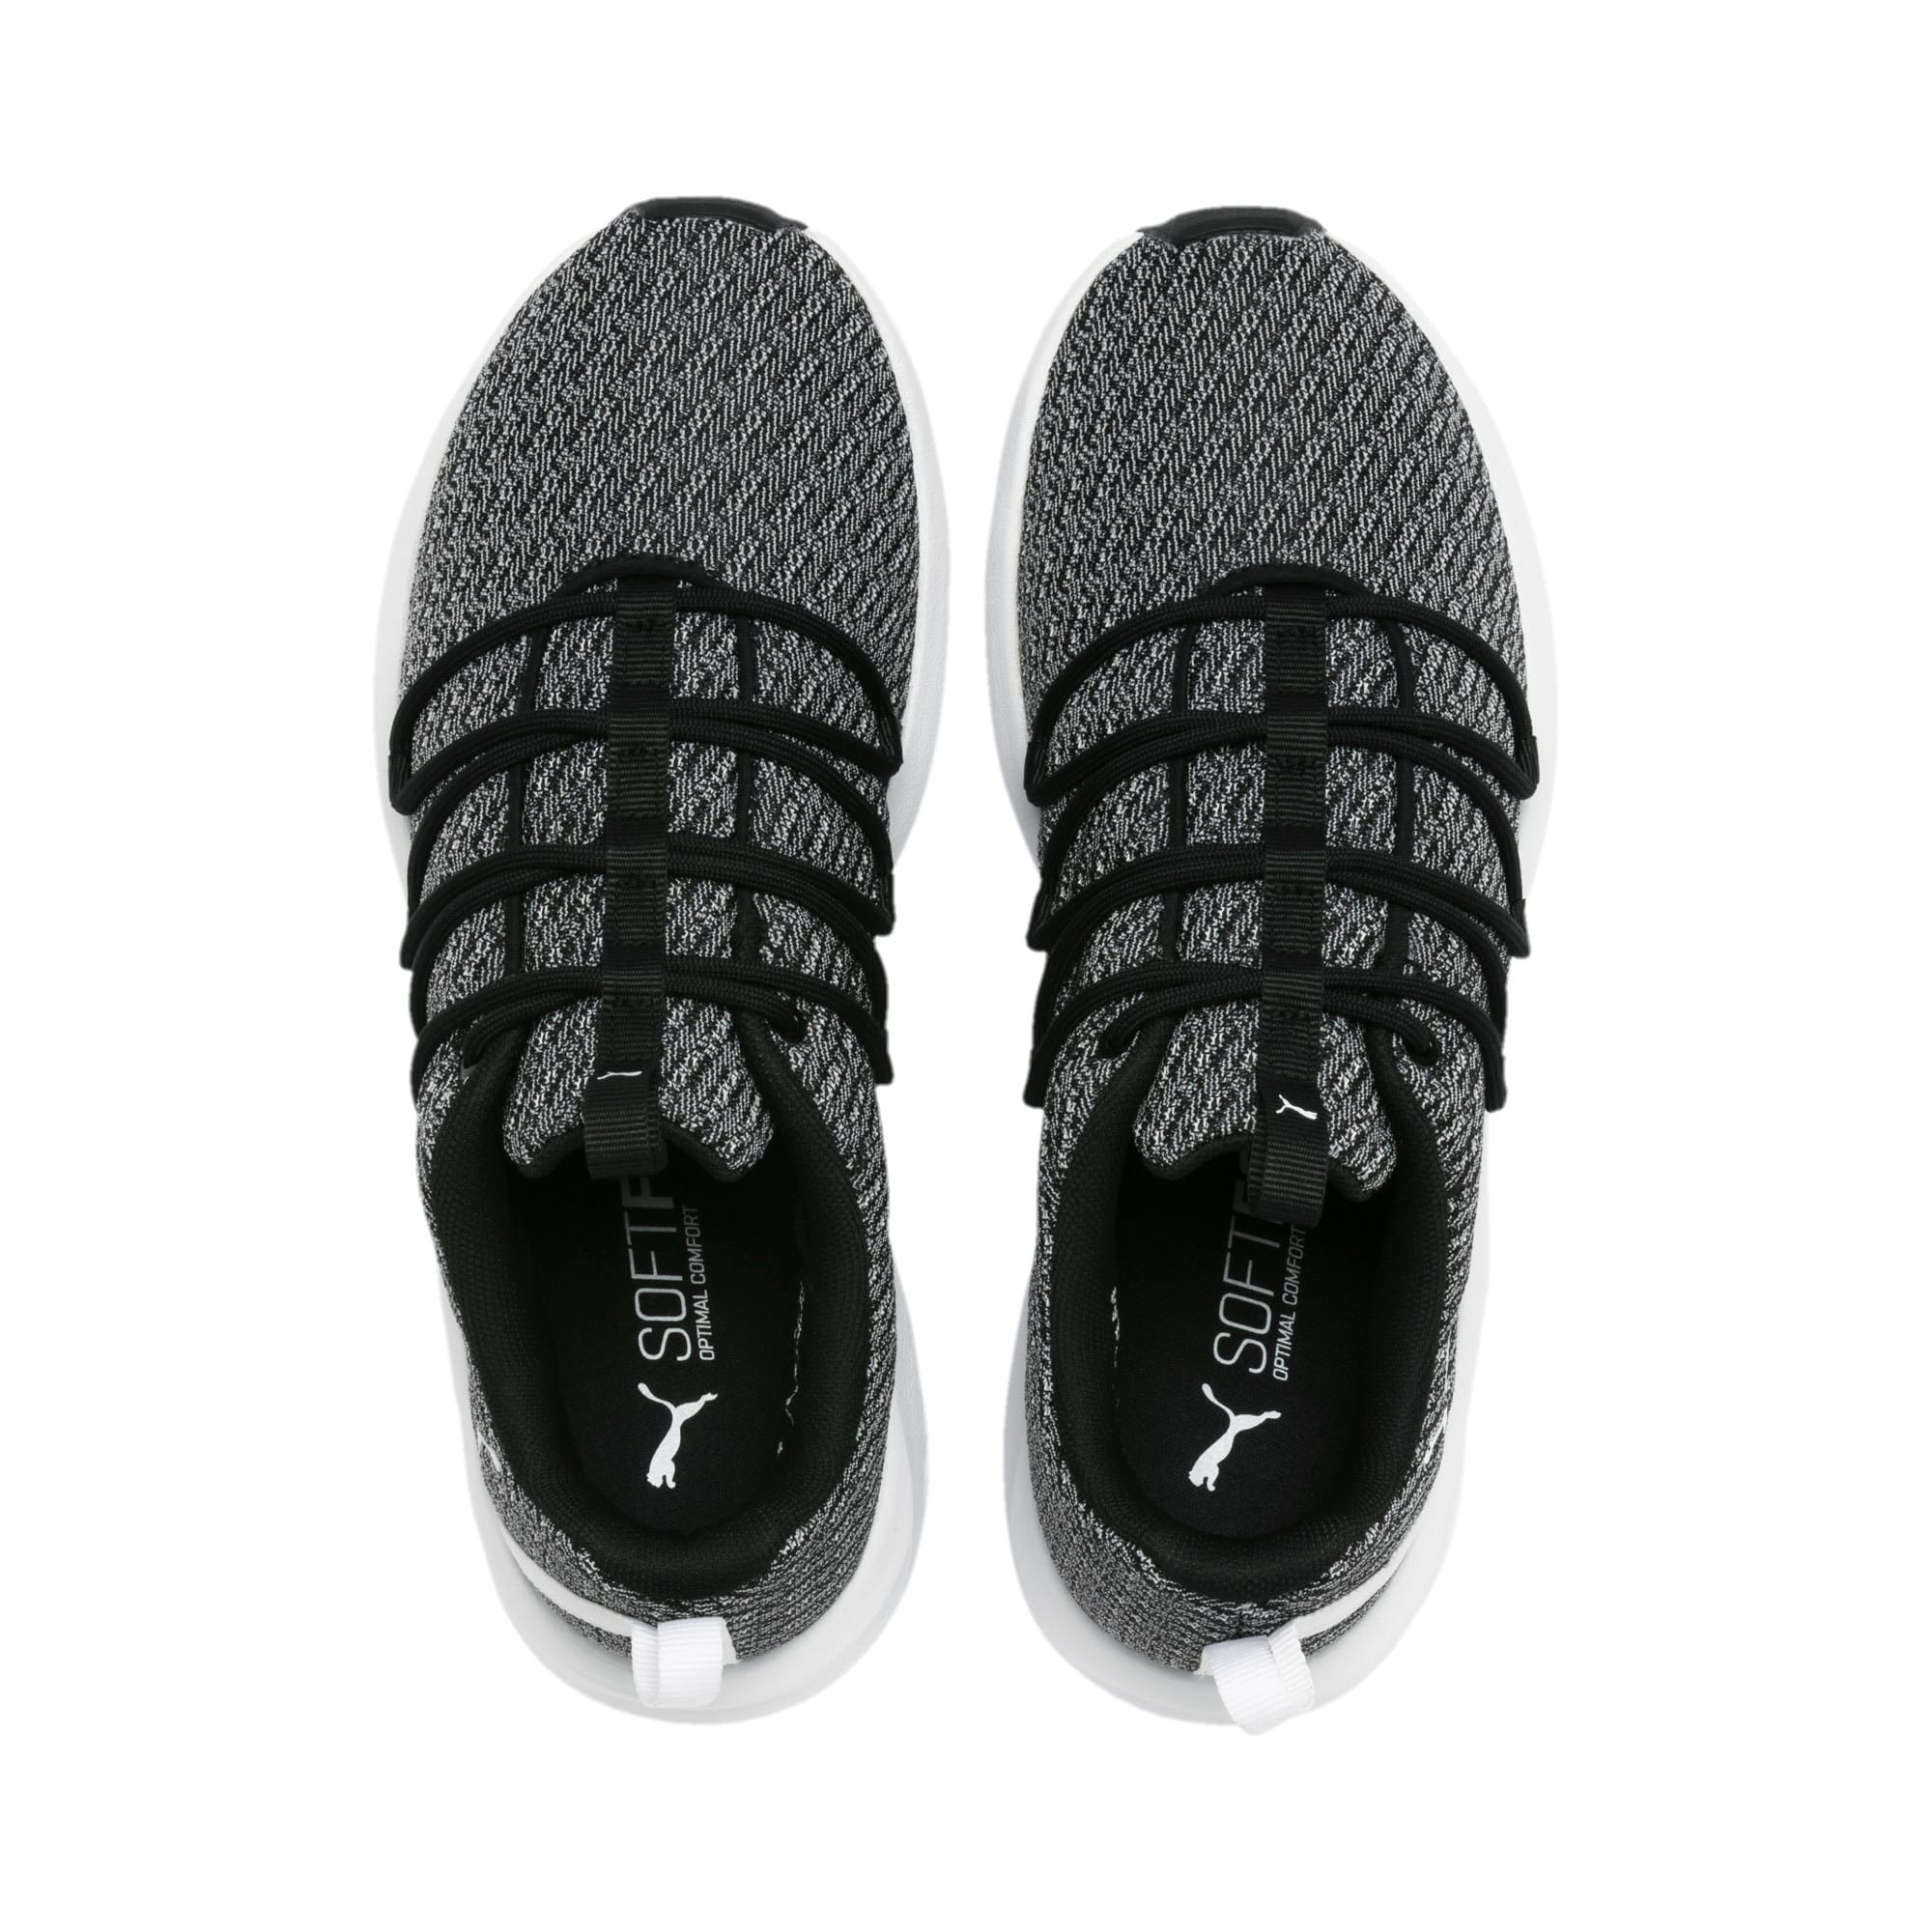 Thumbnail 7 of Prowl Alt Neon Women's Training Shoes, Puma Black-Puma White, medium